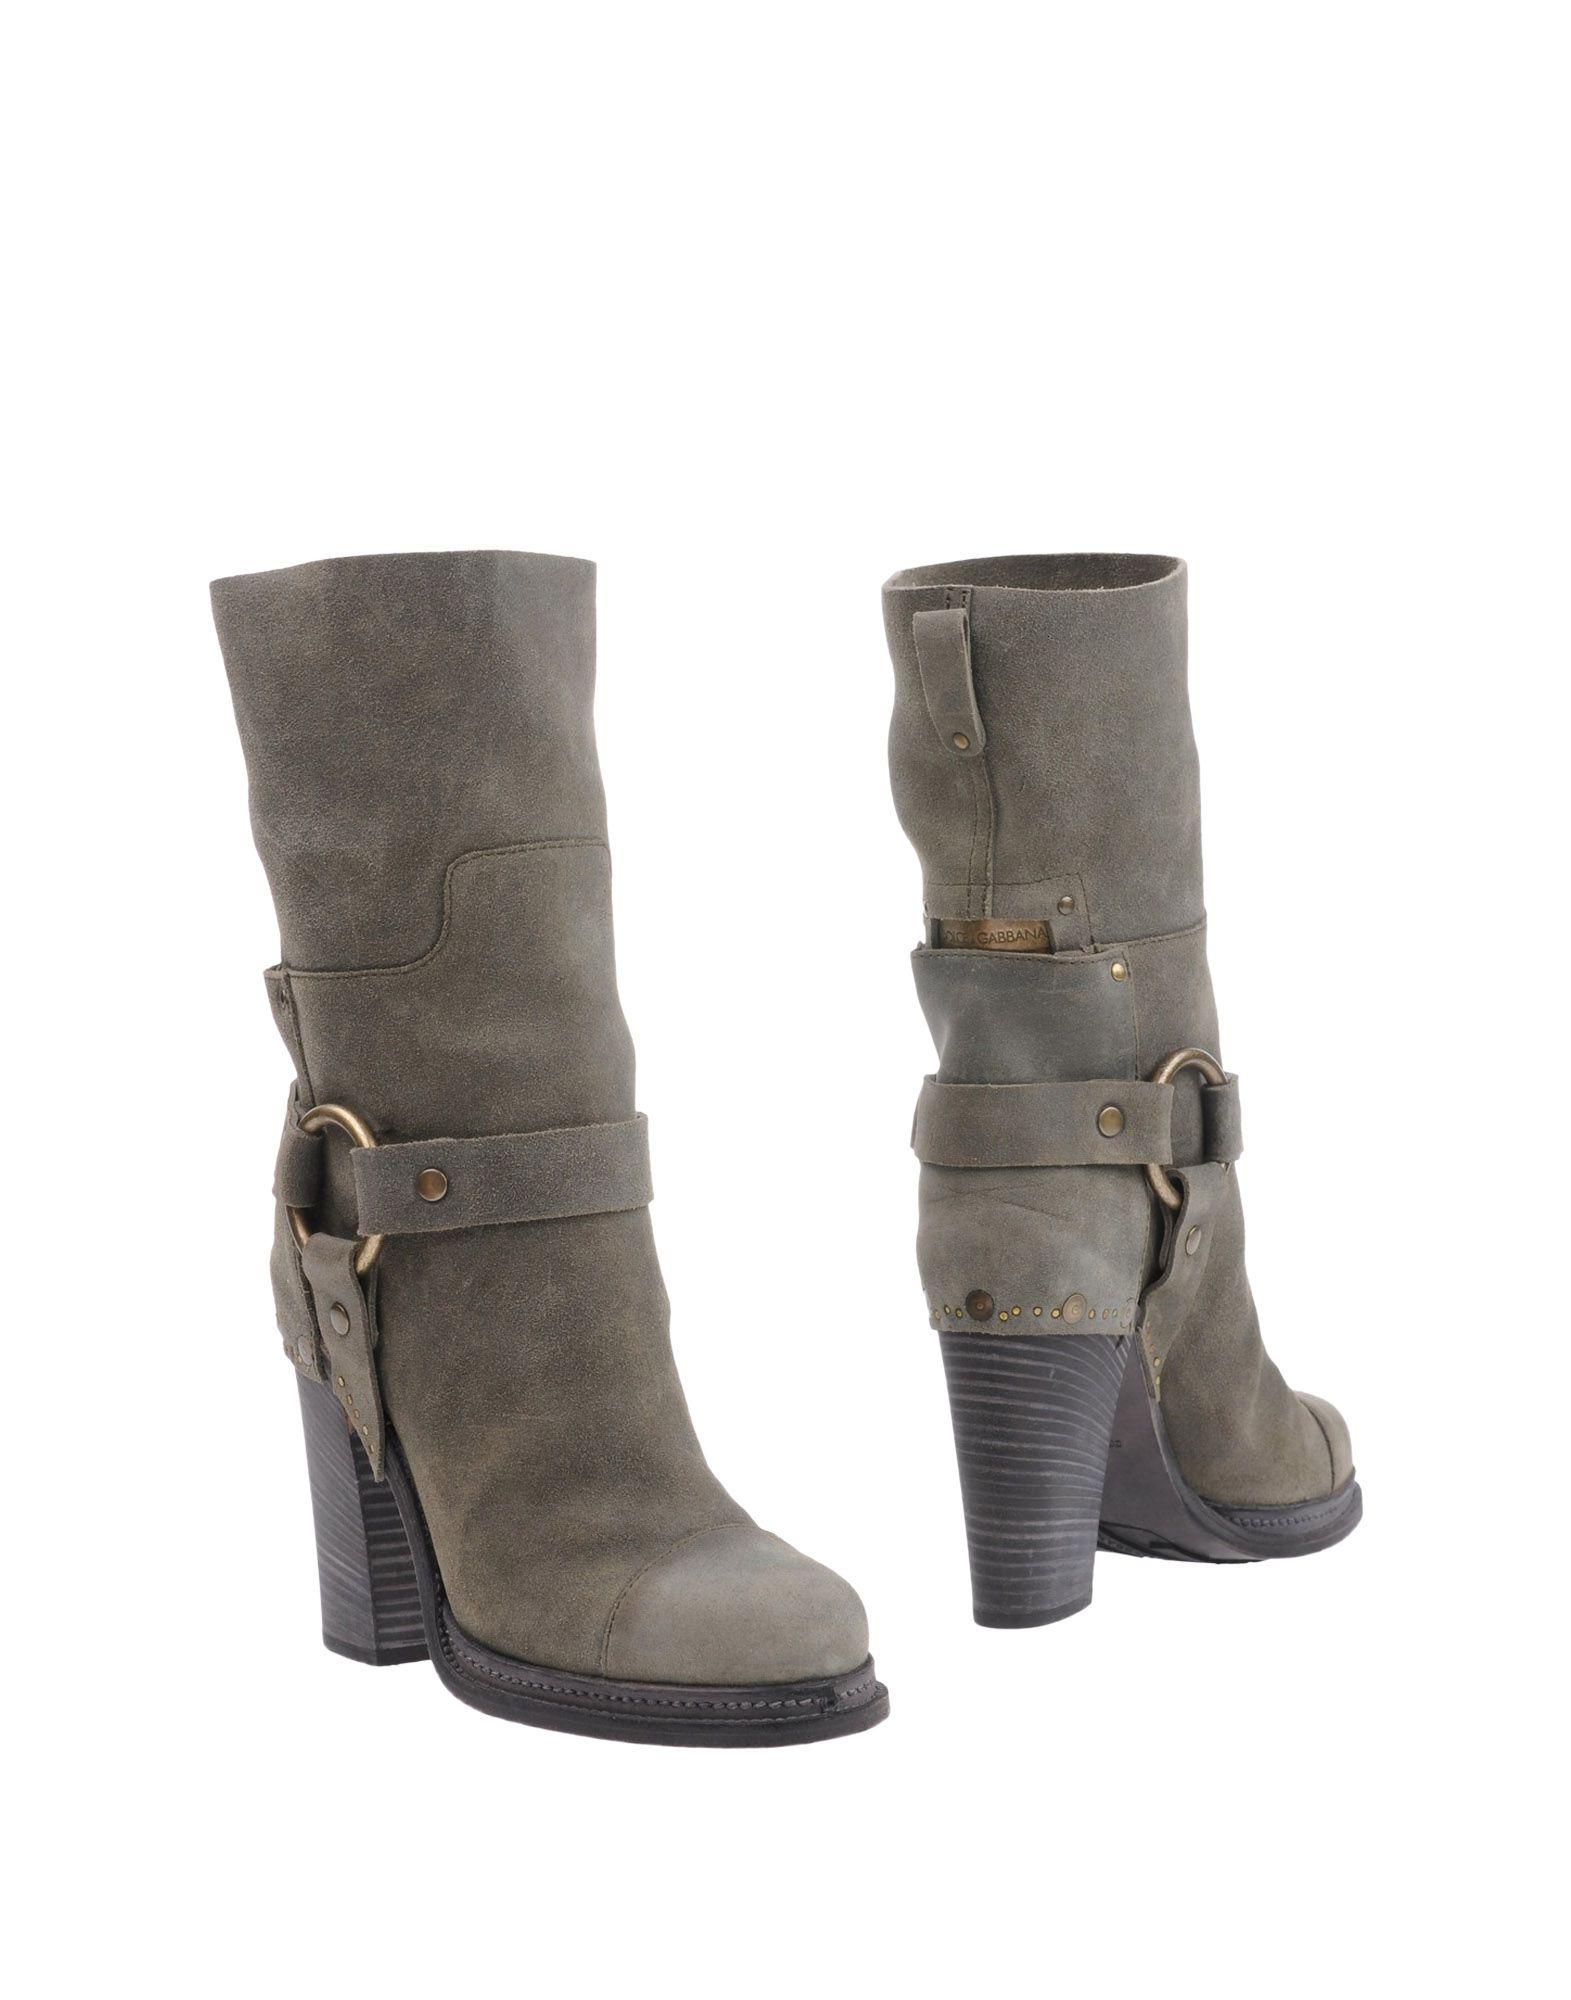 DOLCE & GABBANA Полусапоги и высокие ботинки одежда из кожи dolce gabbana g9z03l fult6 dolce